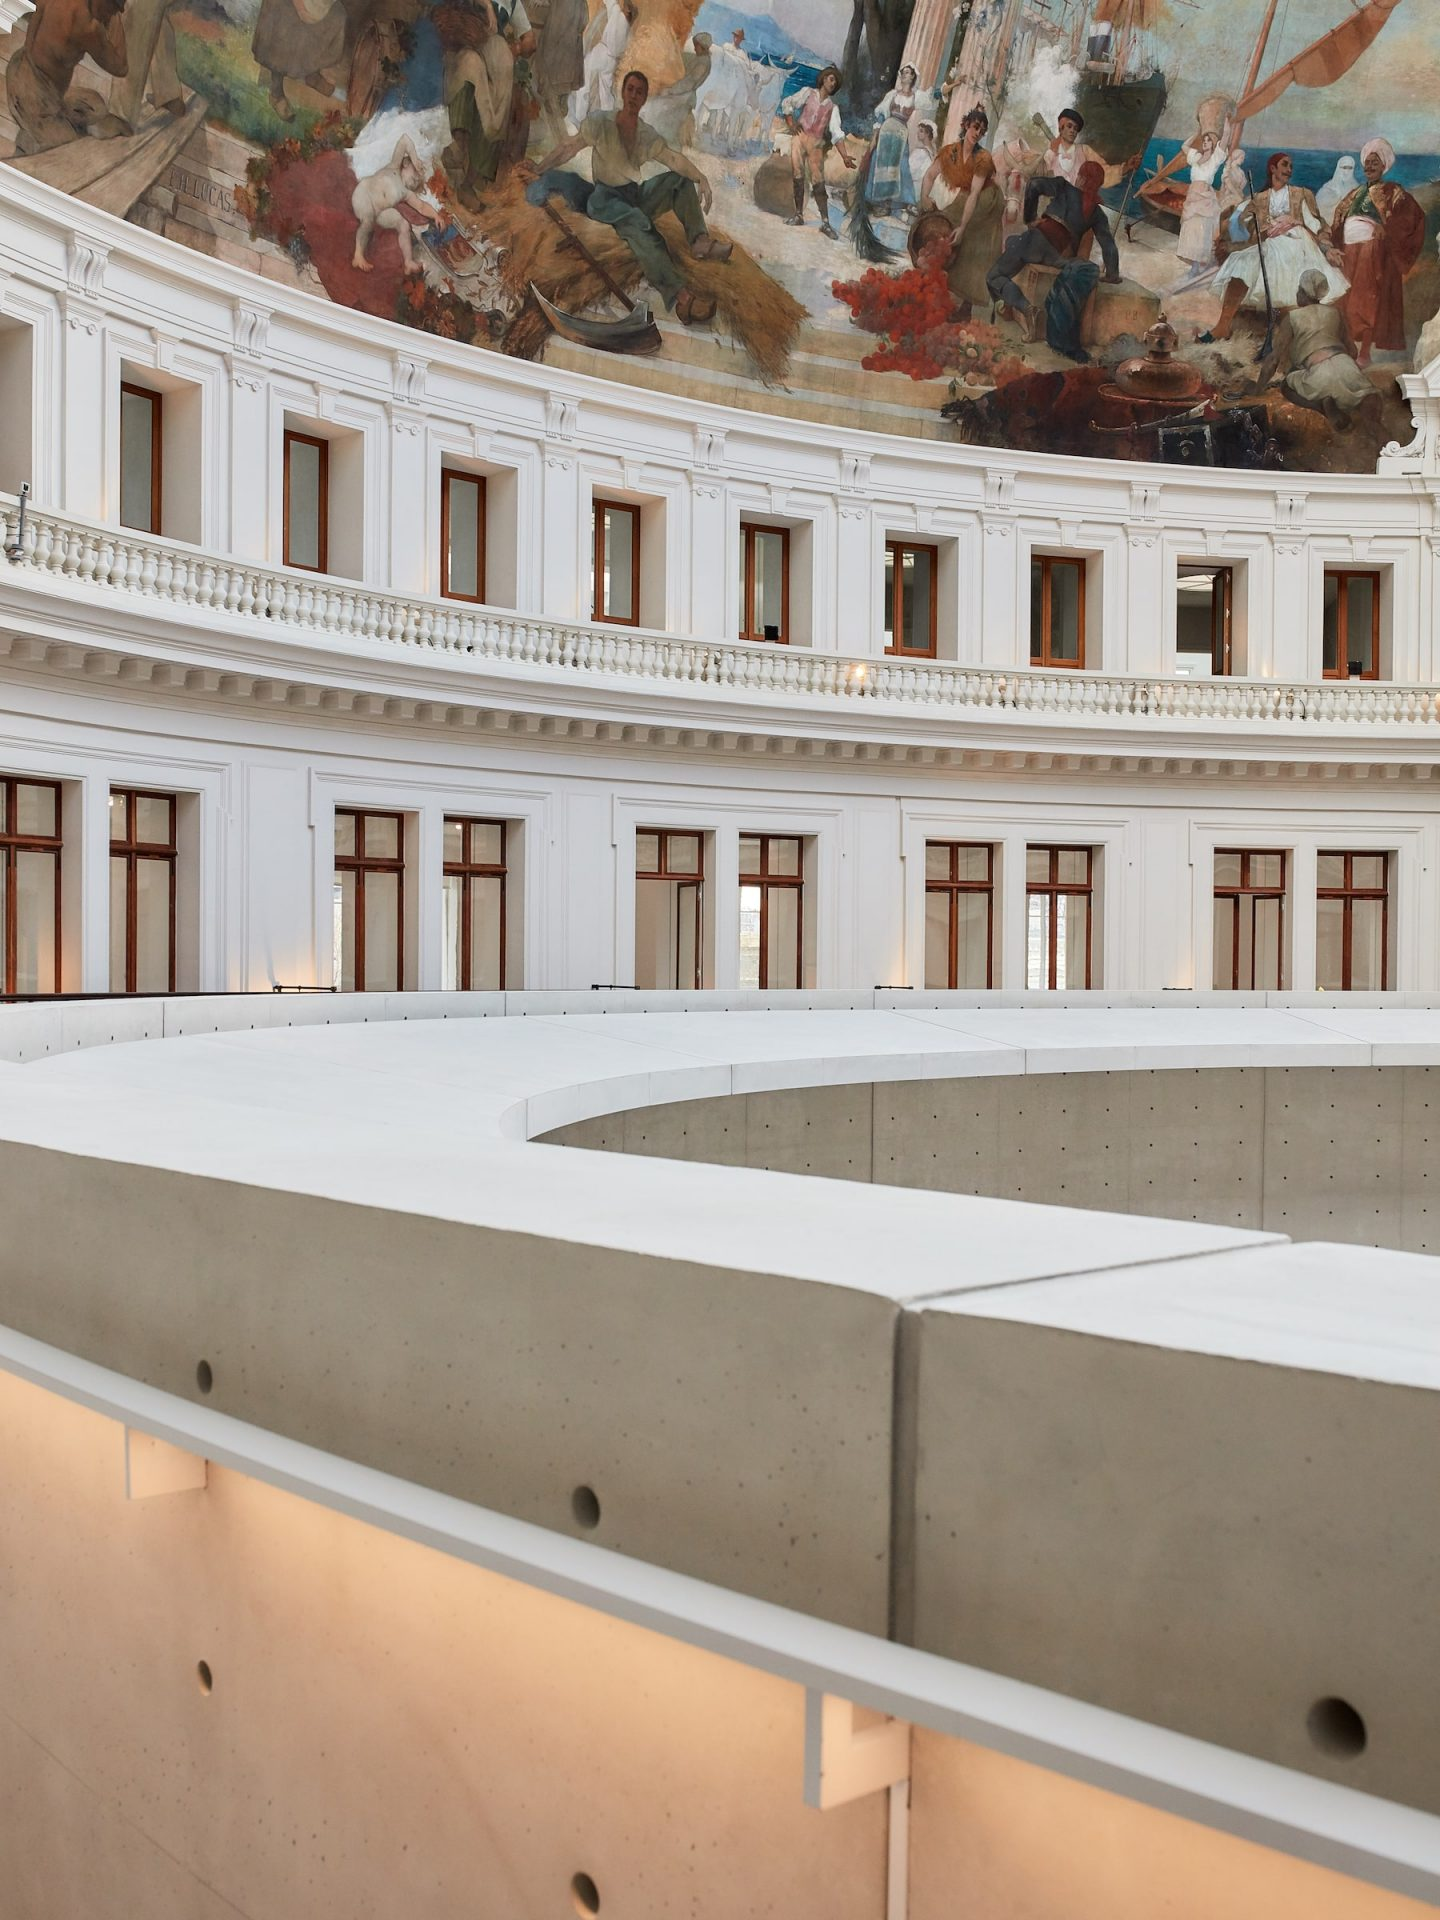 IGNANT-Architecture-Paris-Bourse-de-Commerce-Maxime-Tetard-05